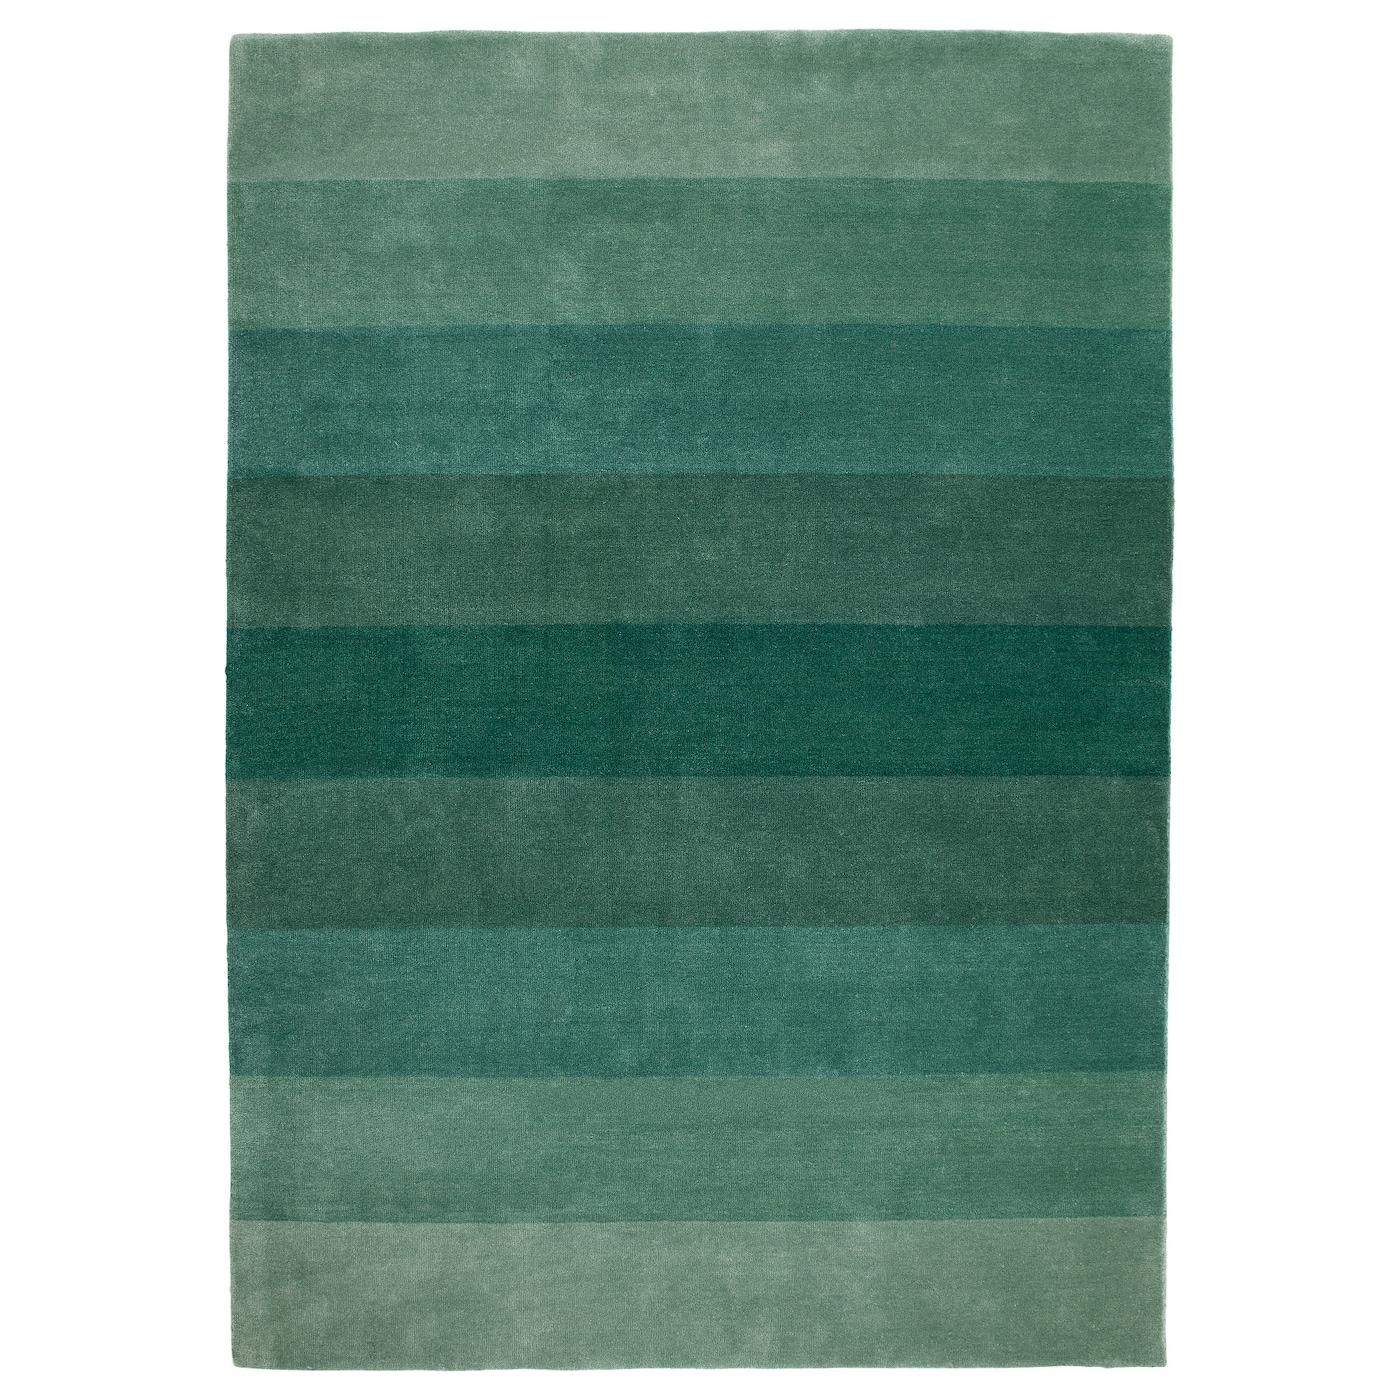 NÖDEBO Rug, Low Pile Handmade/green 170x240 Cm